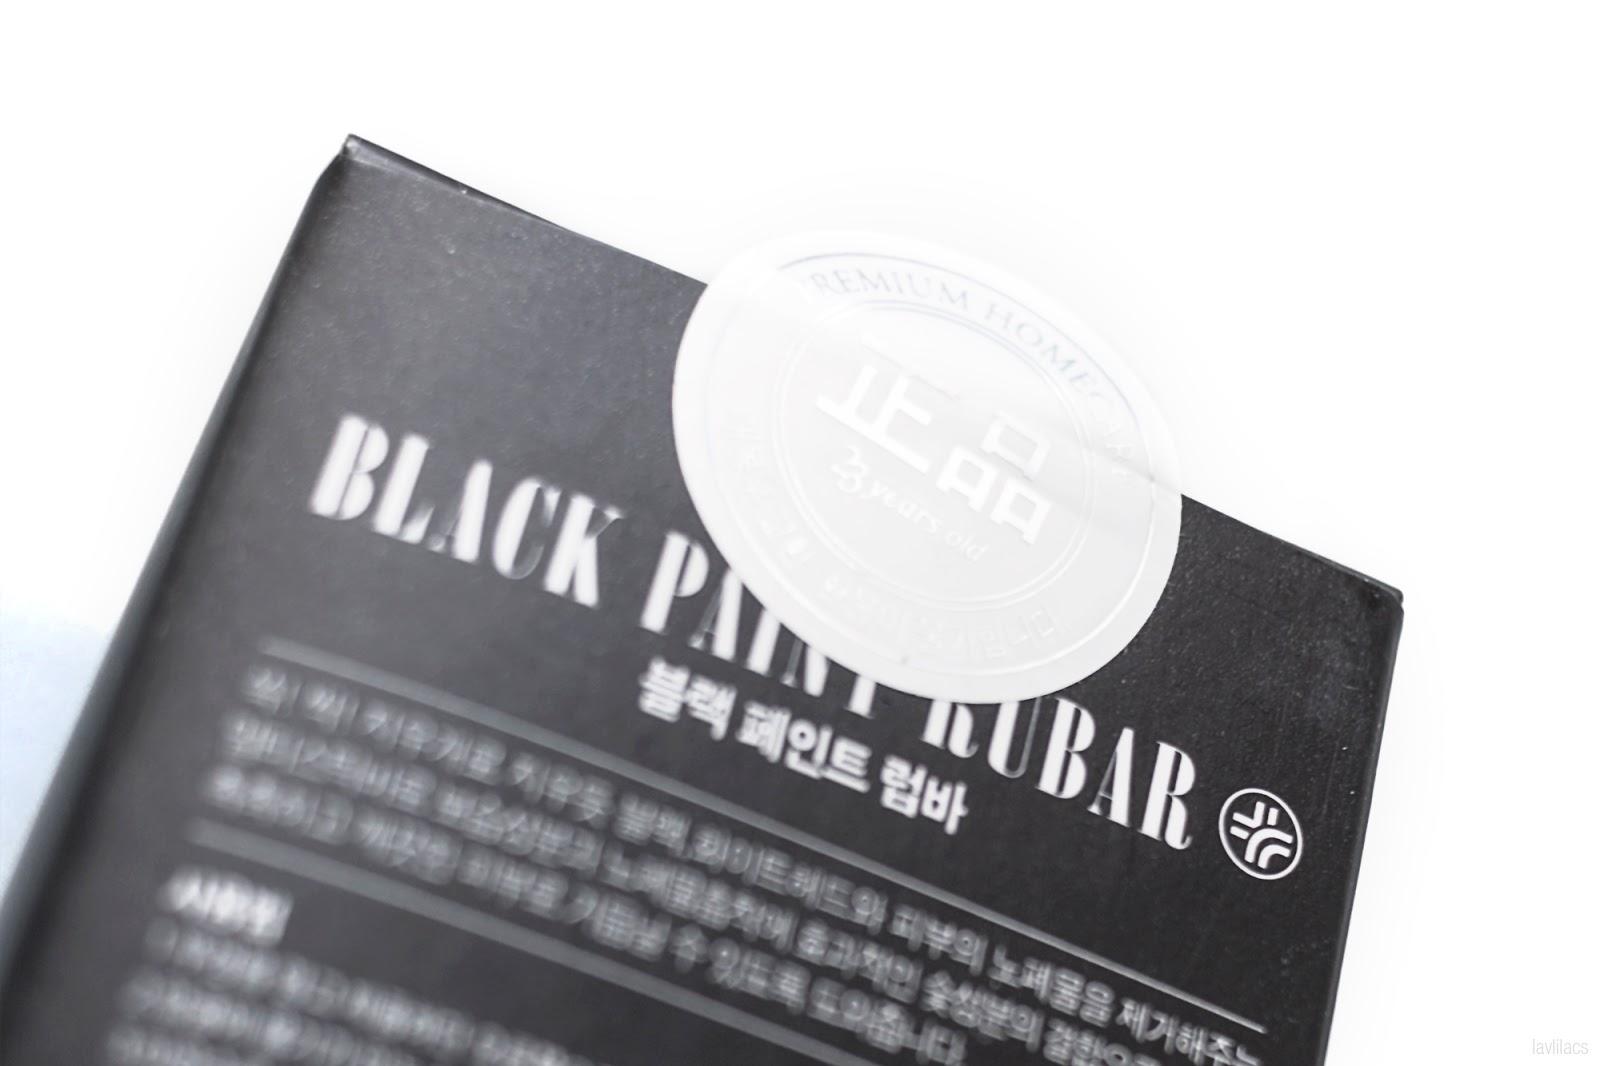 lavlilacs 23 Years Old Black Paint Rubar seal